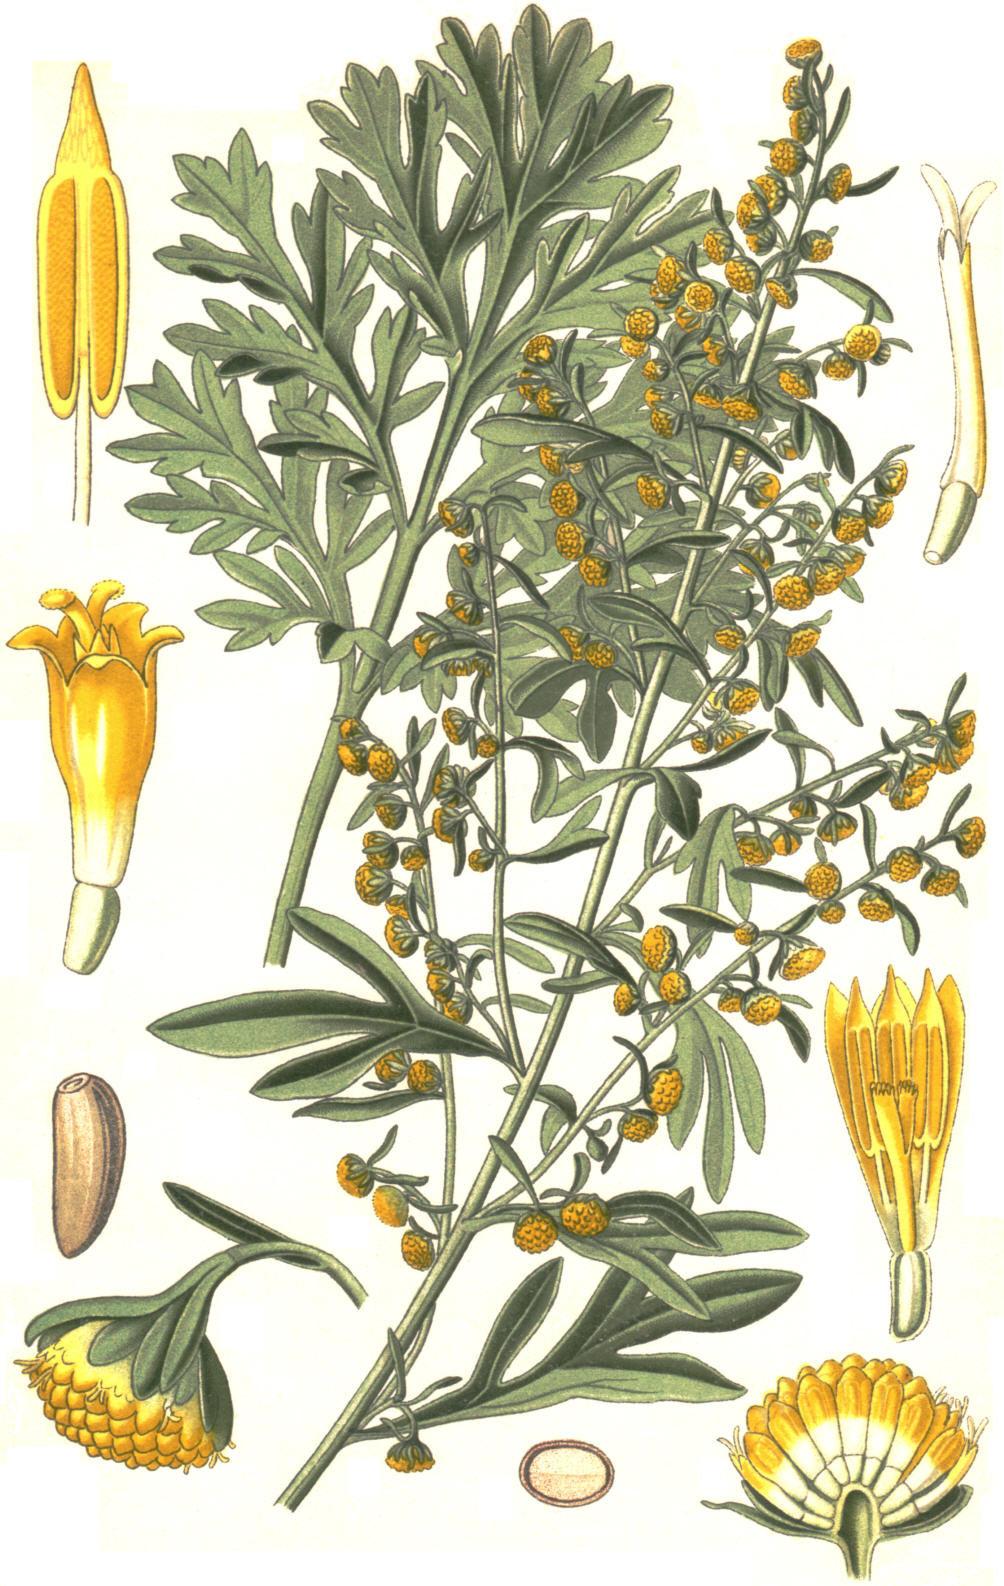 Artemisia Absinthium Wormwood: Dancing In The Shadows: Wormwood (Artemisia